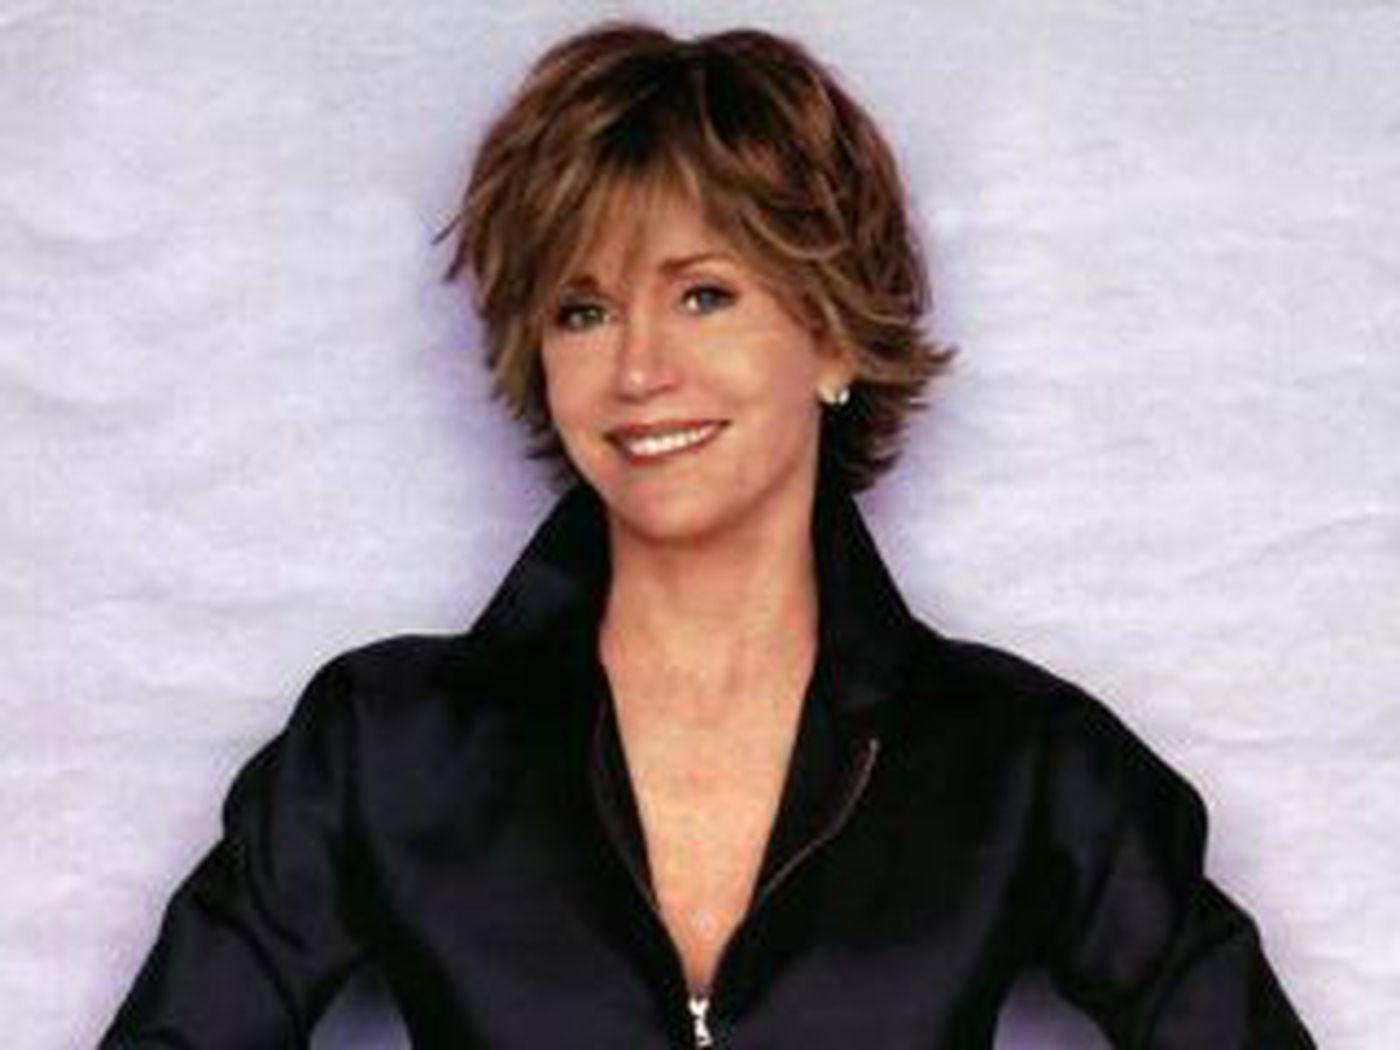 Jane Fonda honored by Meryl Streep, Sally Field and more